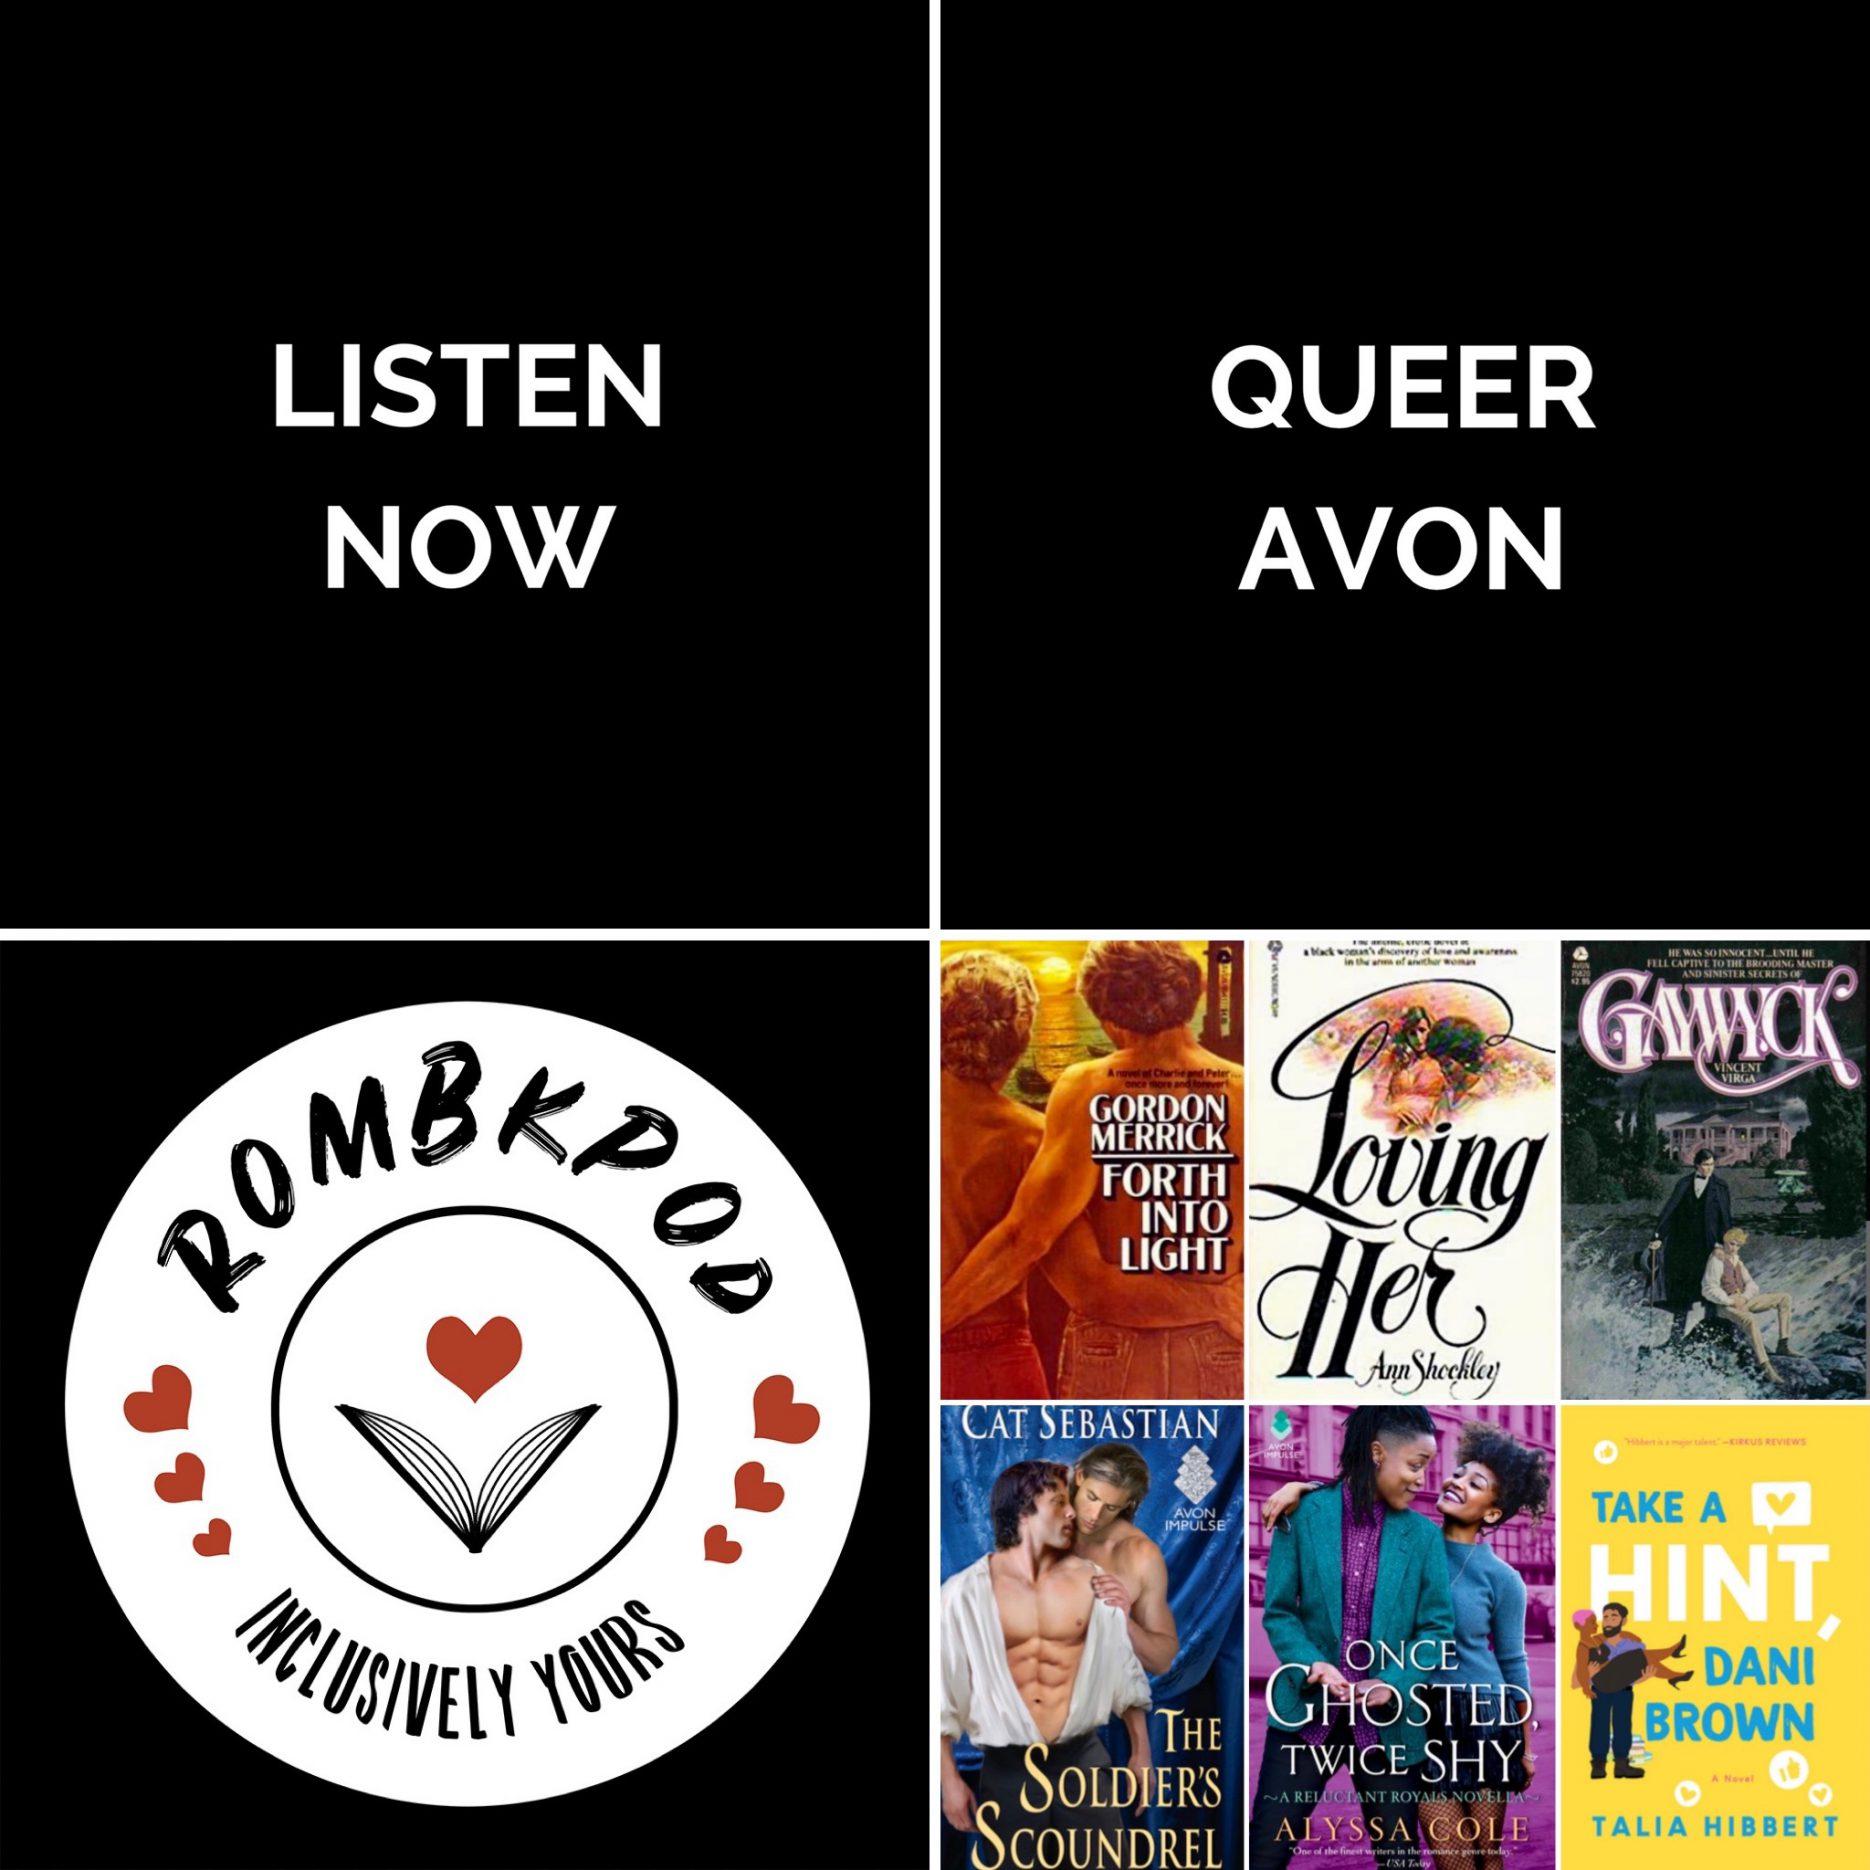 "IMAGE: lower left corner, RomBkPod heart logo; lower right corner, Queer Avon book cover collage; IMAGE TEXT: Listen Now, ""Queer Avon"""